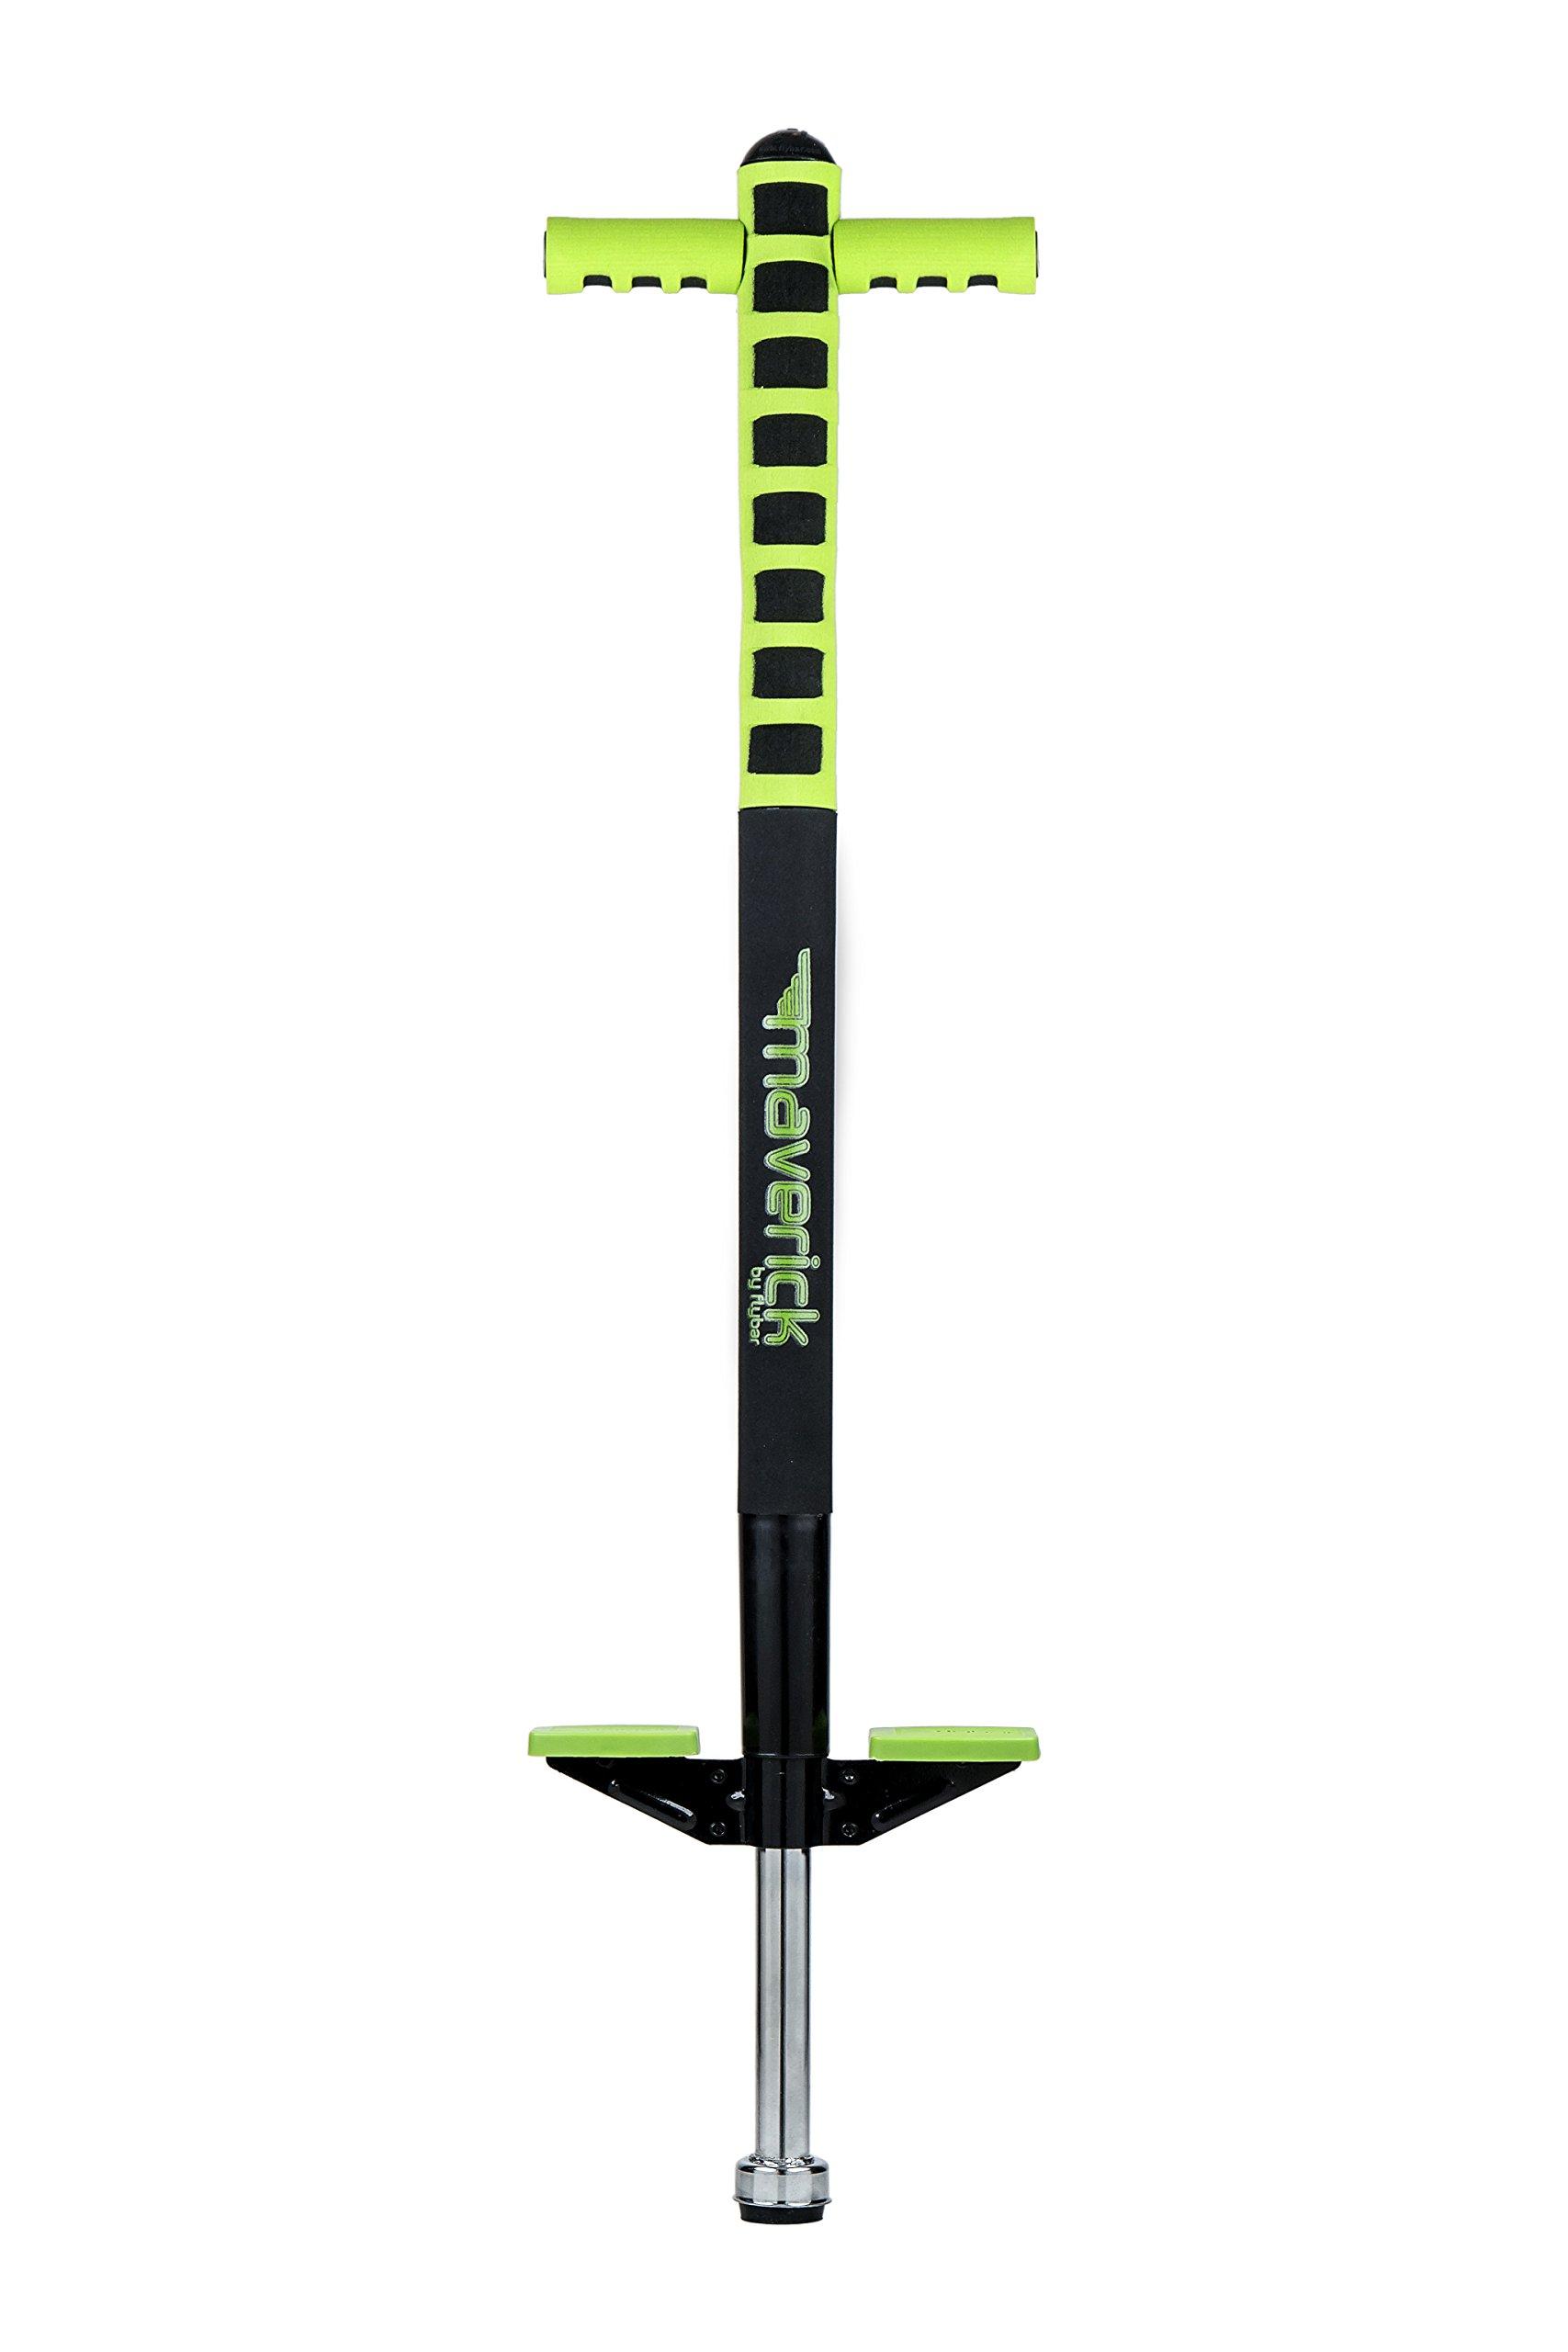 Flybar Foam Maverick Pogo Stick (Green/Black) by Flybar